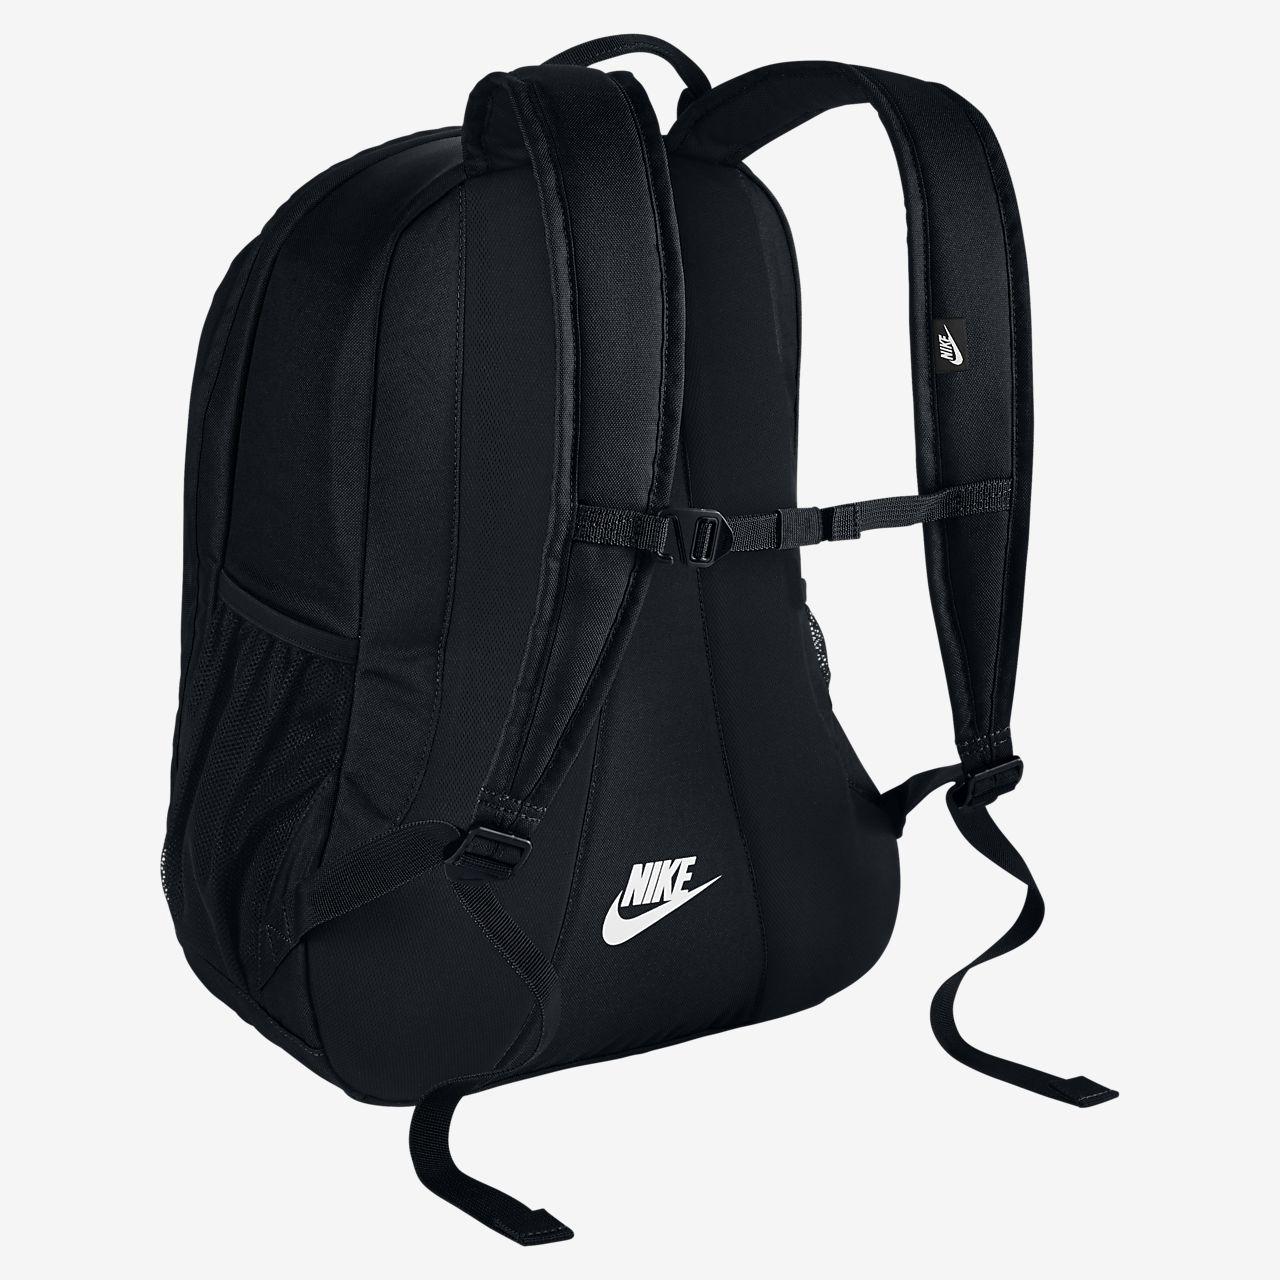 11e55c2557 ... Nike Sportswear Hayward Futura 2.0 Backpack